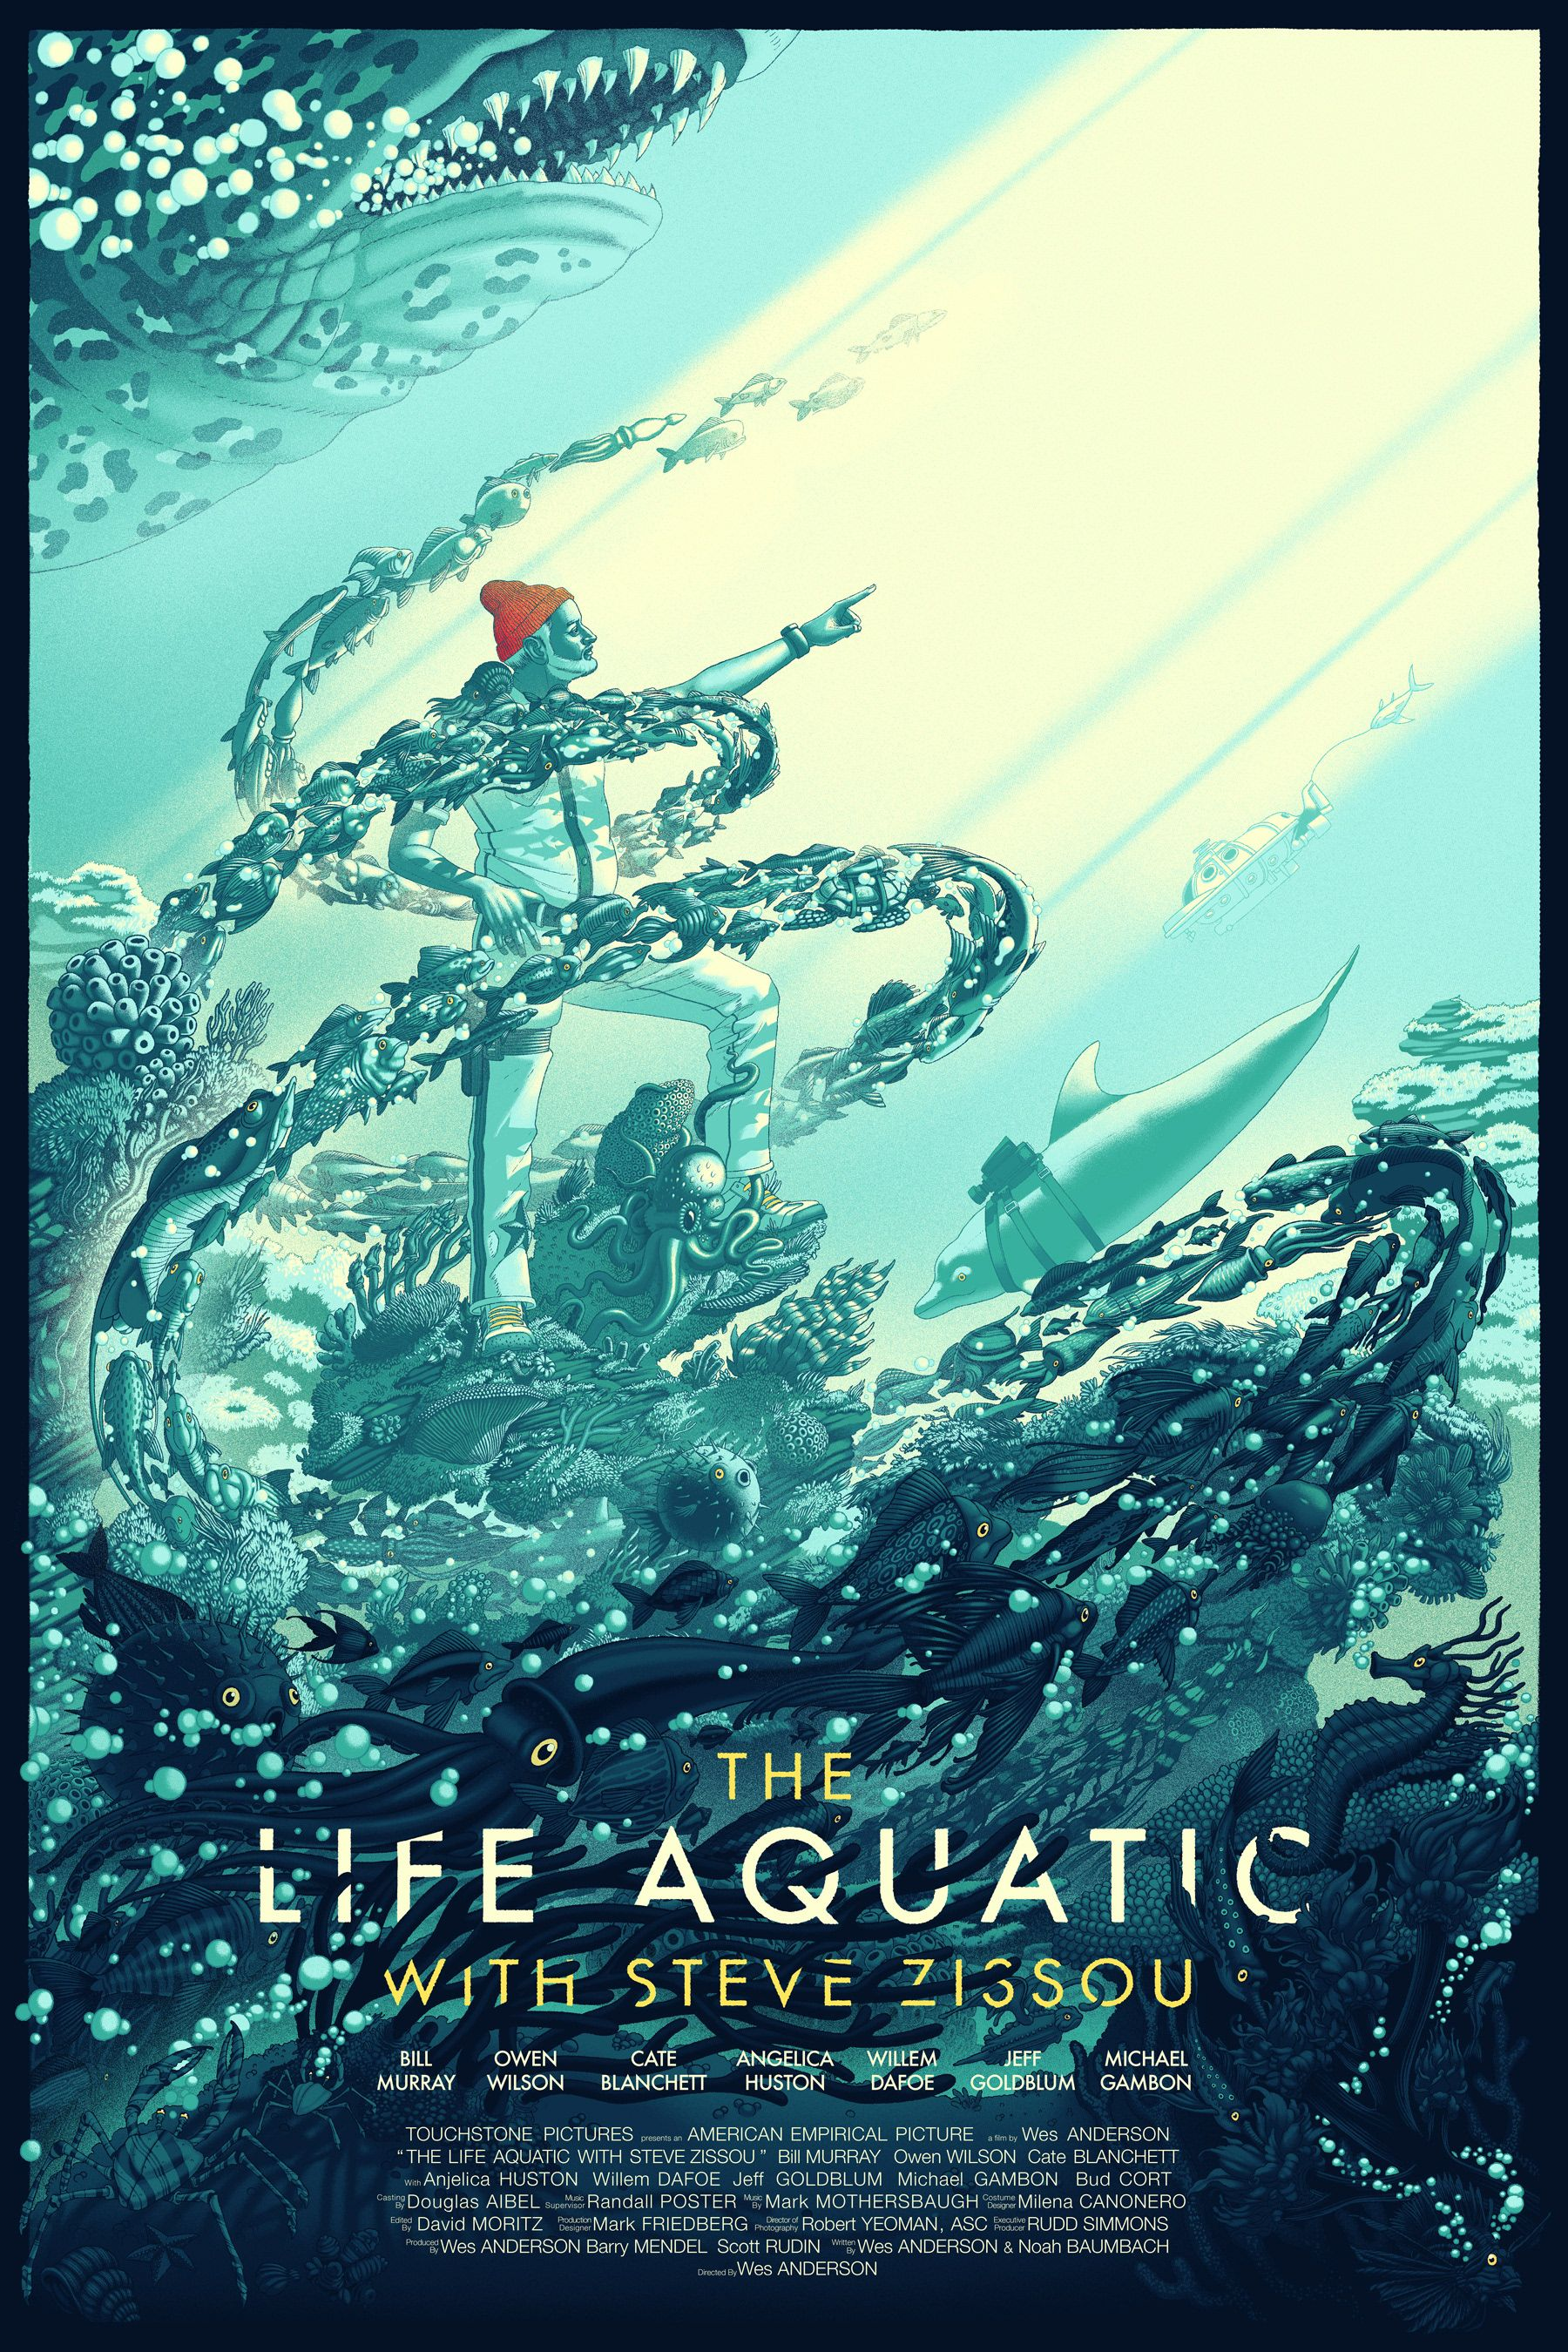 THE LIFE AQUATIC on Behance in 2019 | Life aquatic ...